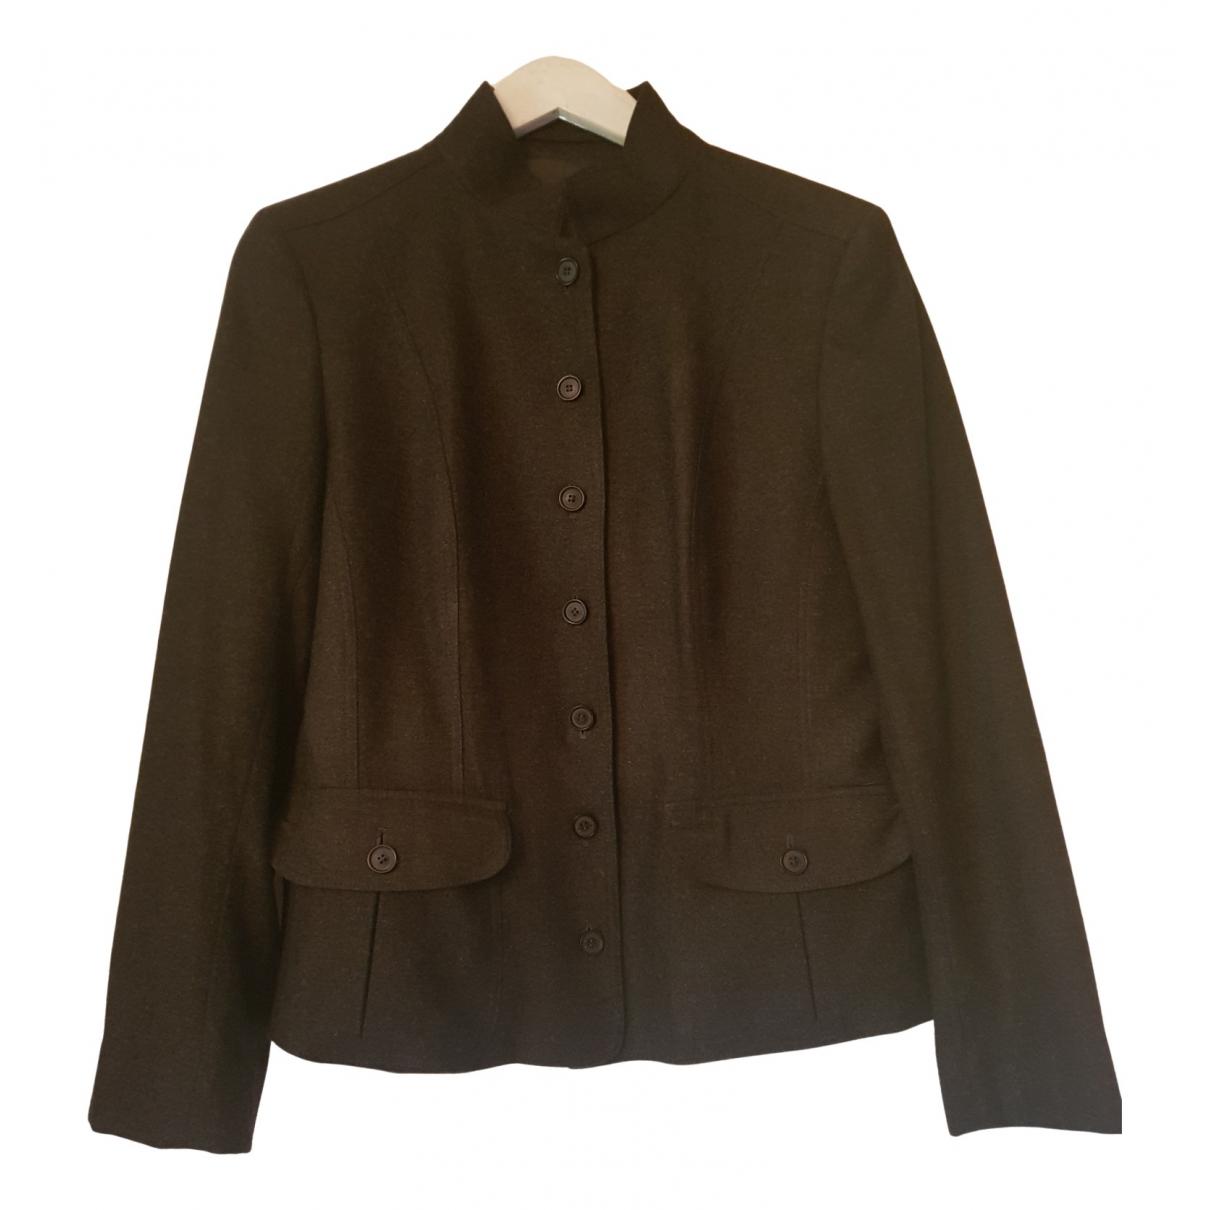 Burberry N Grey Wool jacket for Women 12 UK